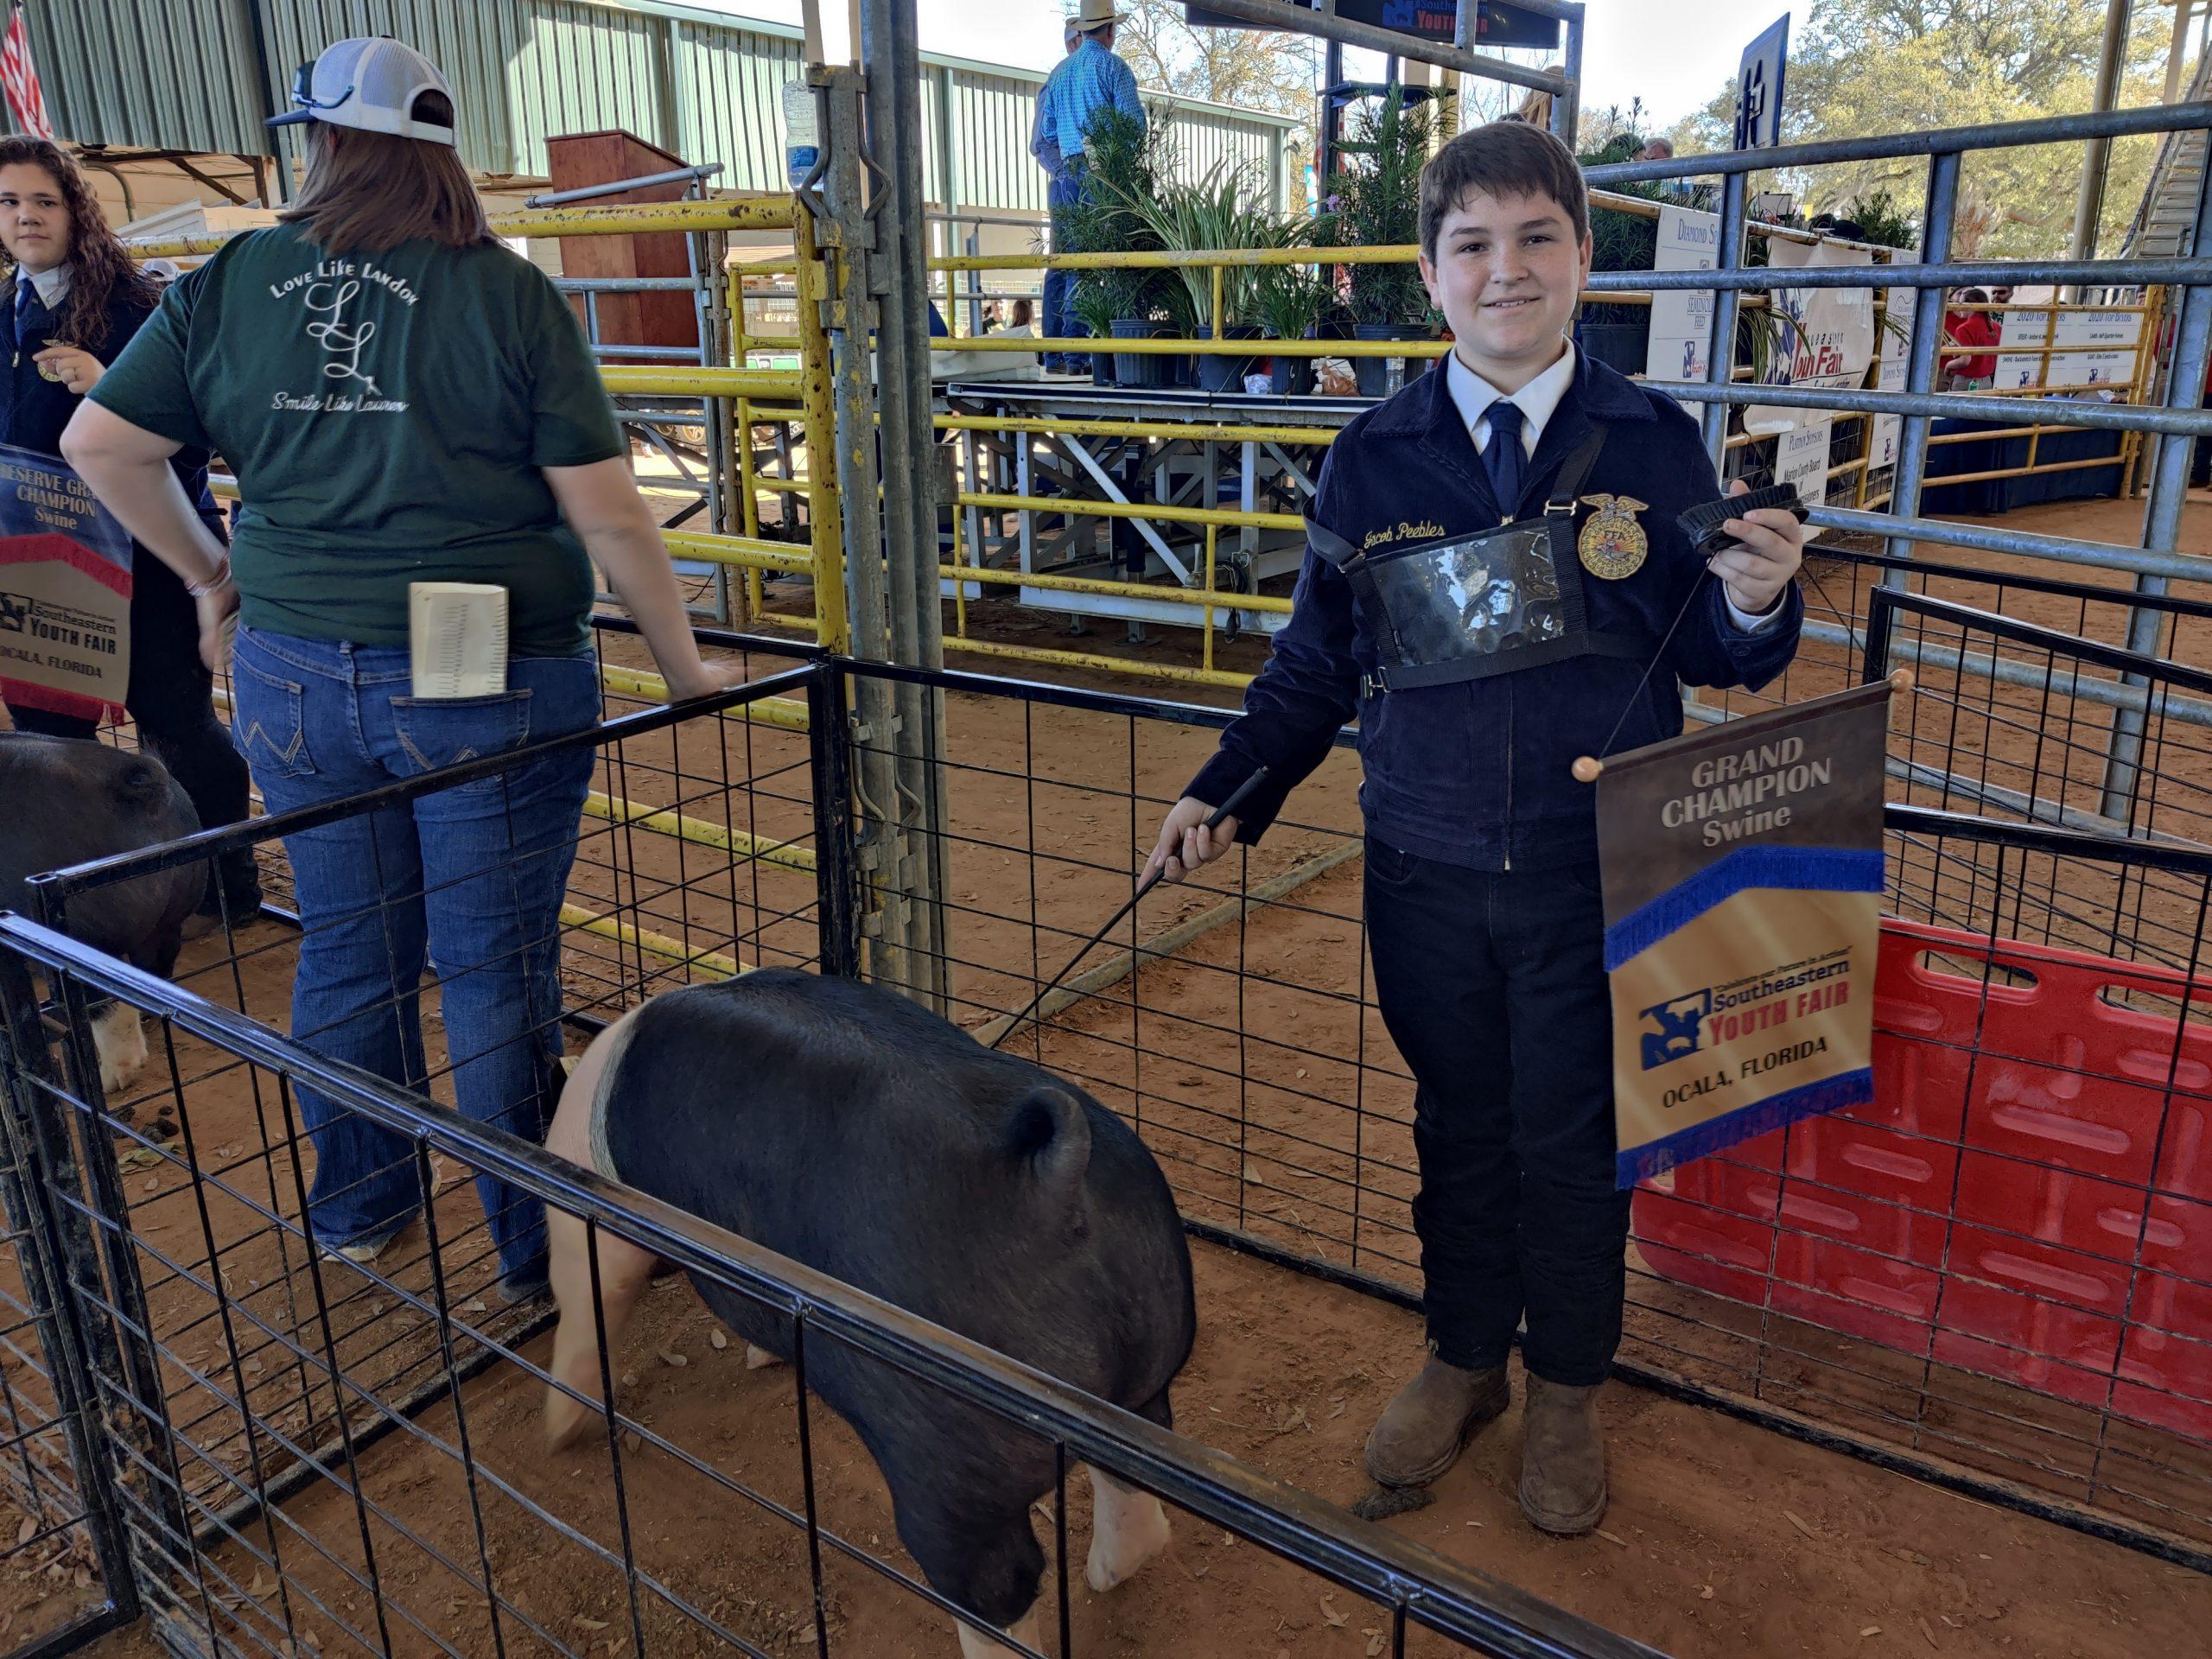 02-27-2021 Grand Champion - Swine